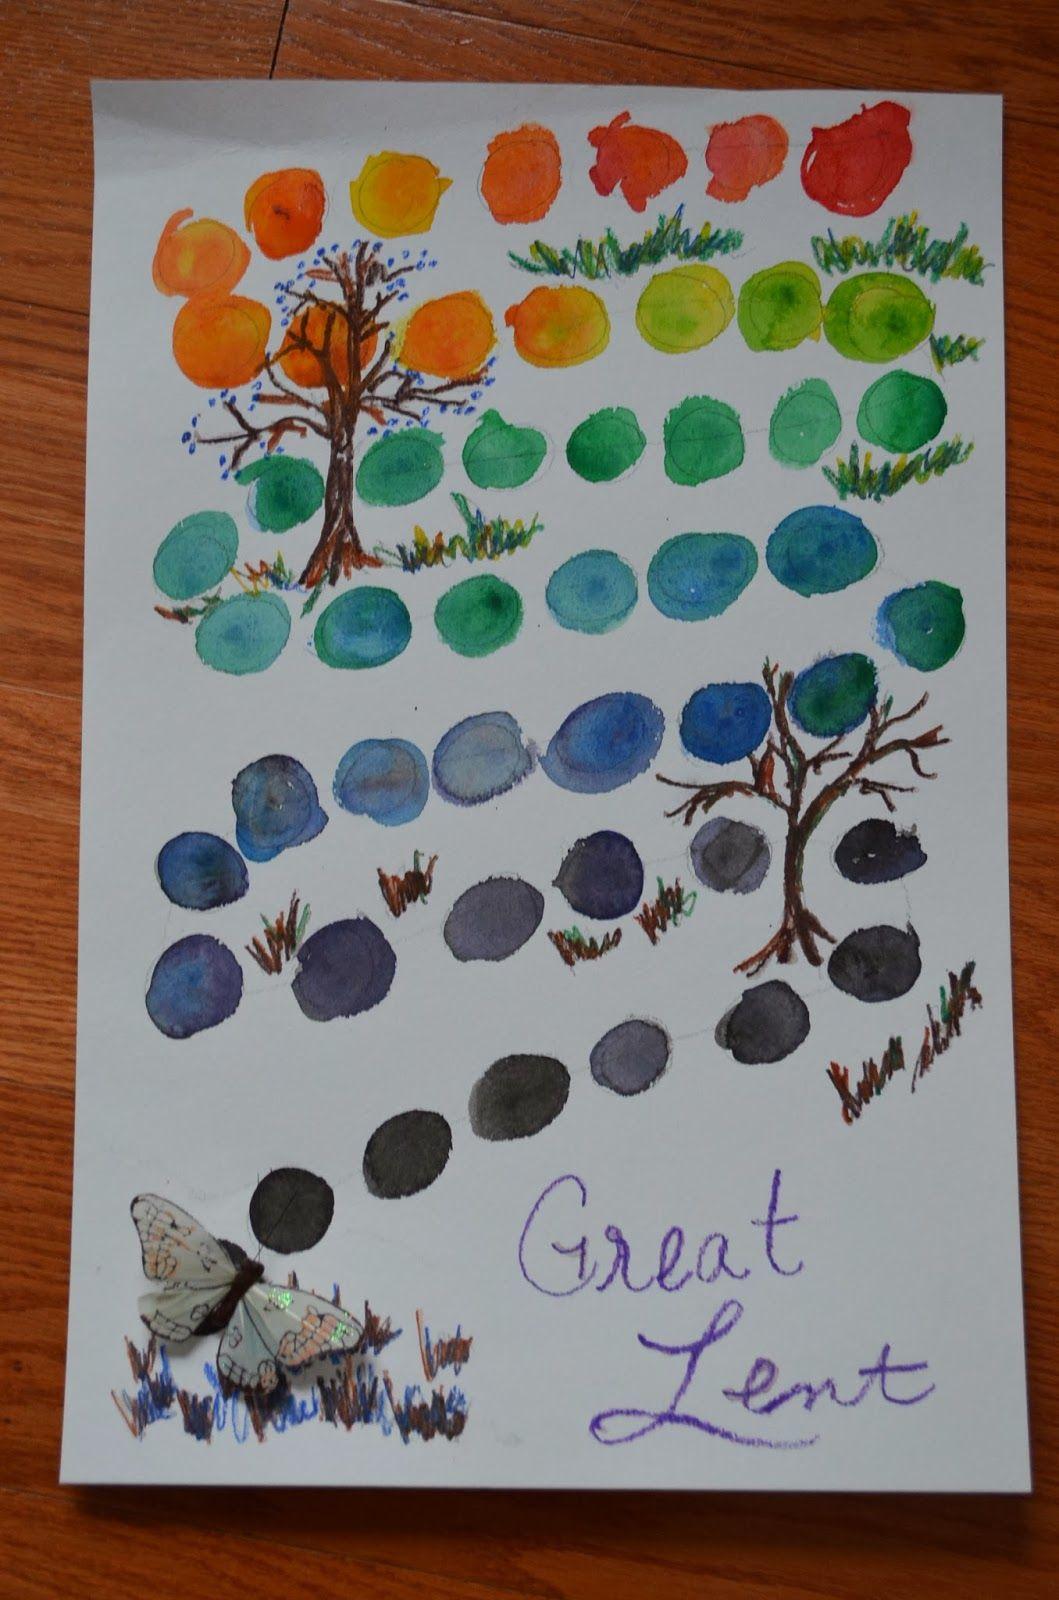 Our Lenten Calendar On Last Year S Post Great Lent For Children I Mentioned A Pretty Lenten